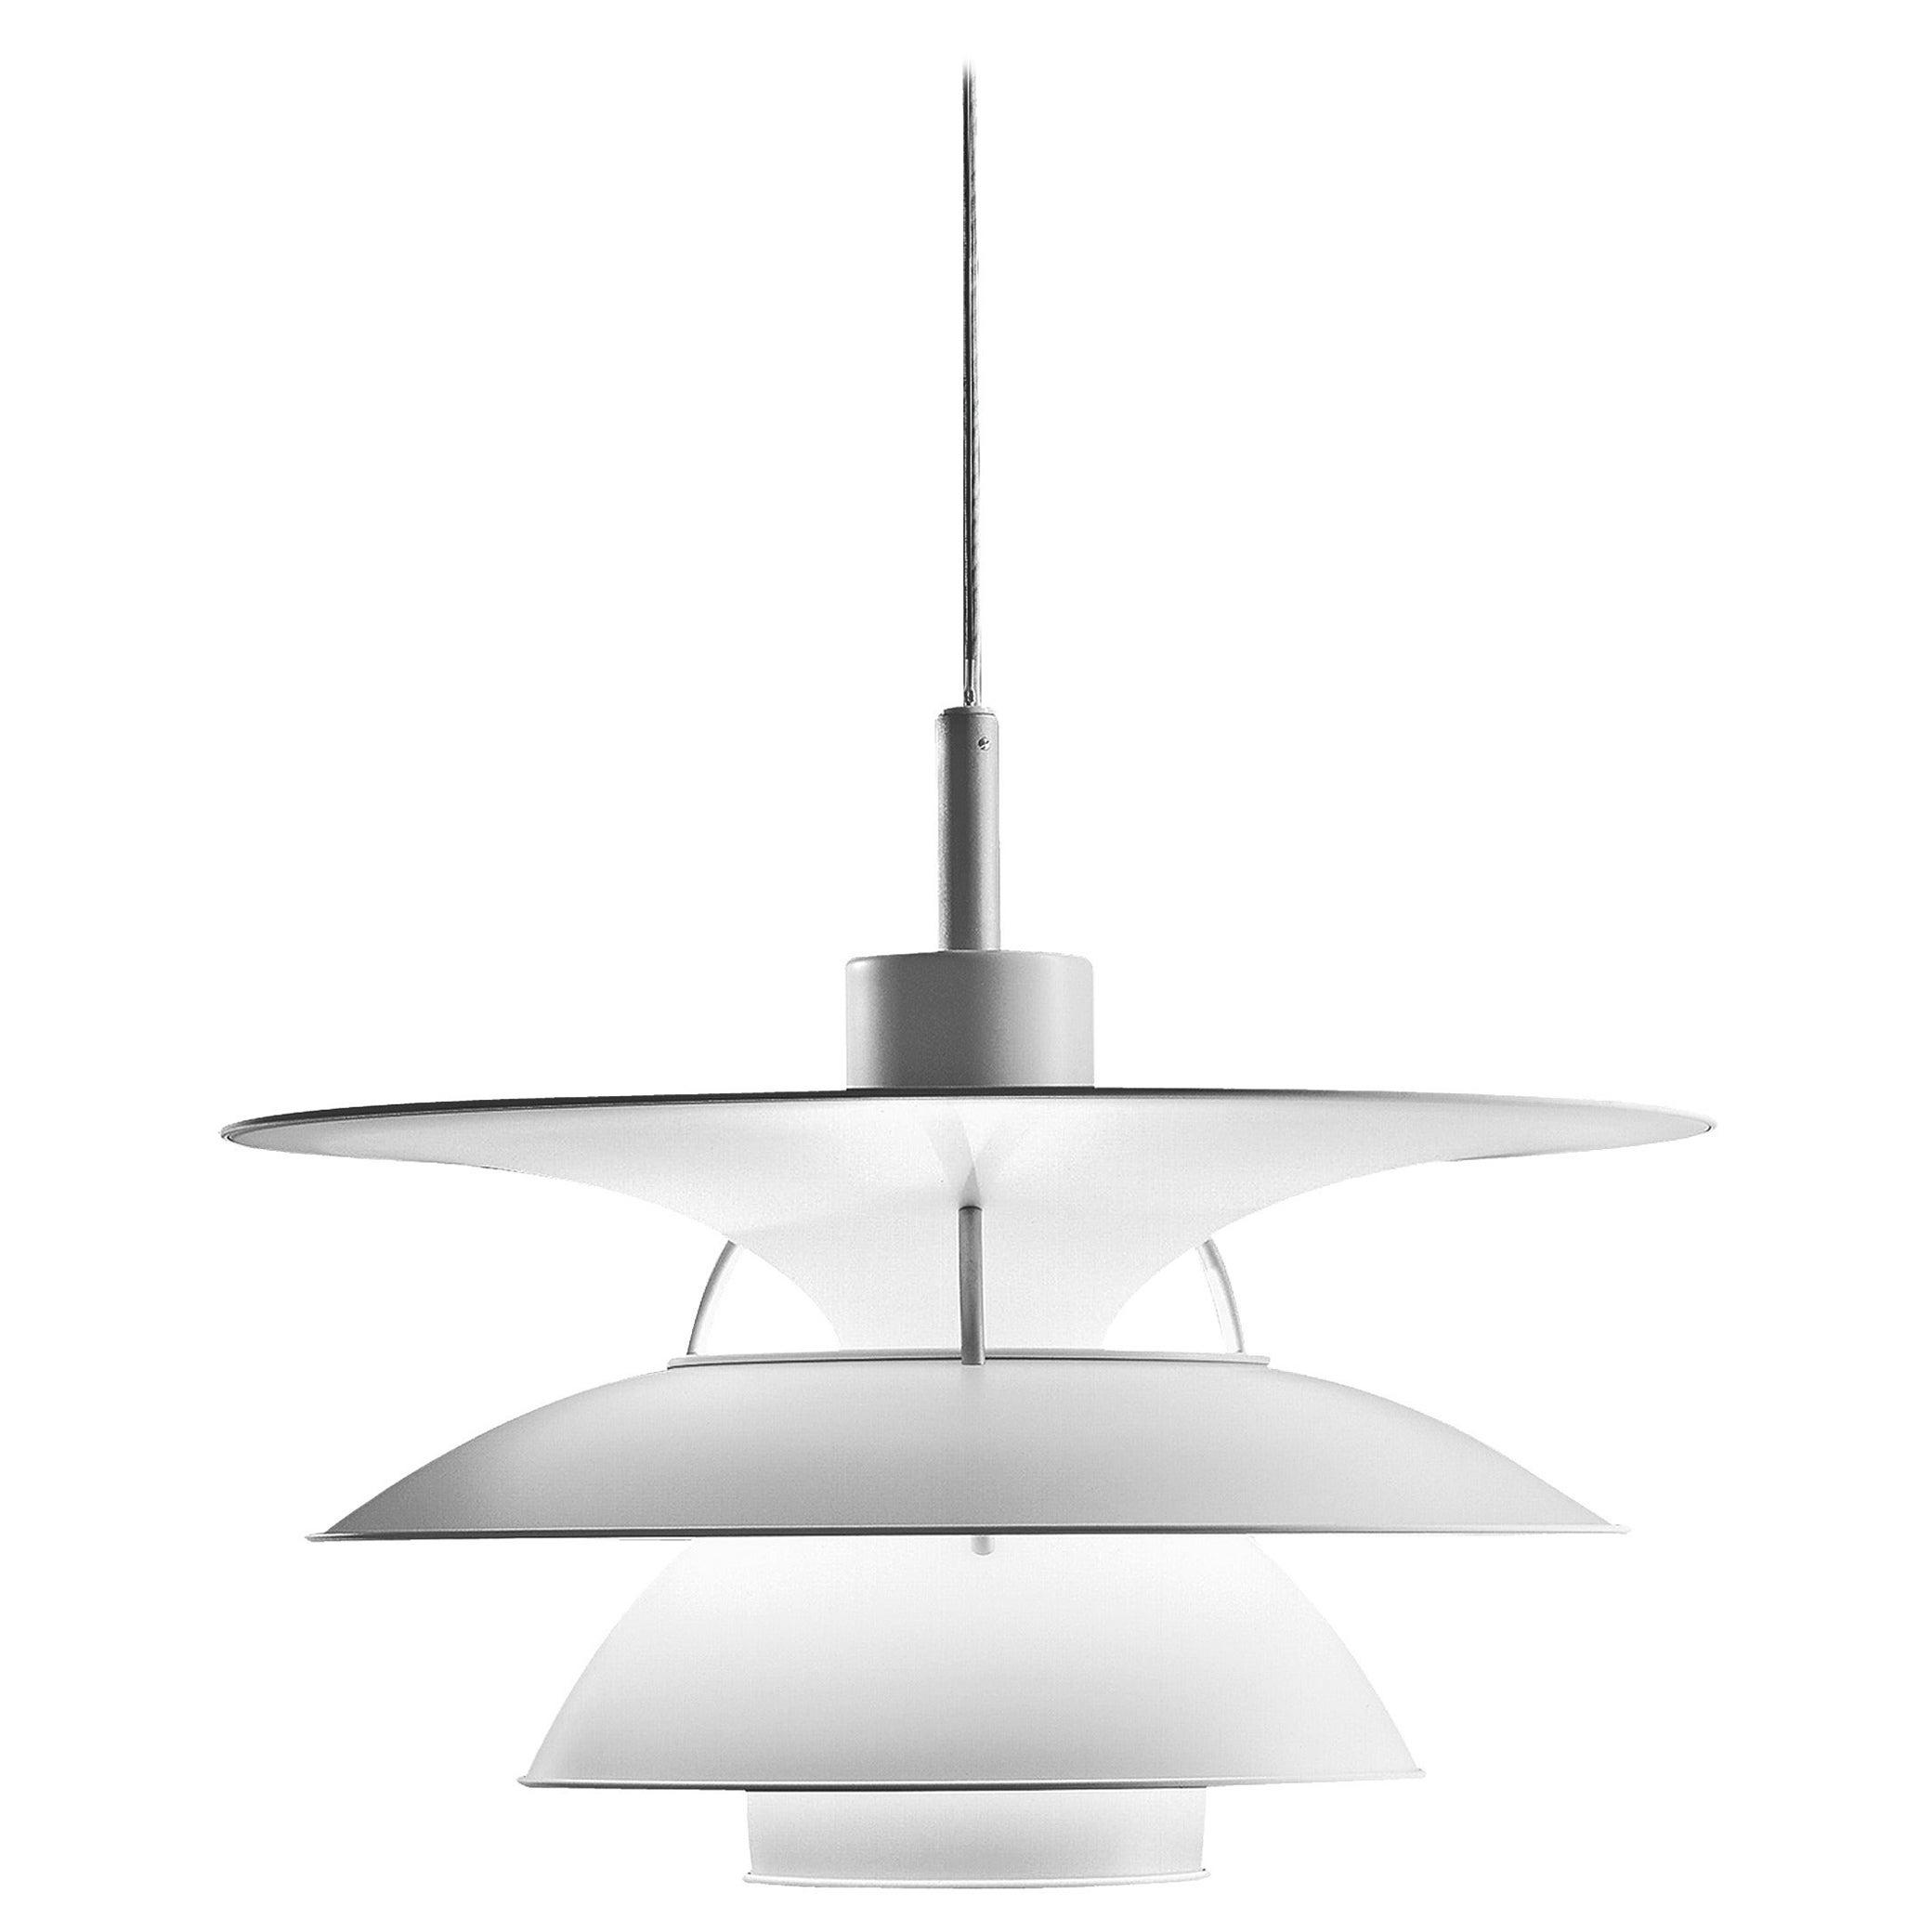 Louis Poulsen PH 6½-6 Pendant Light by Poul Henningsen